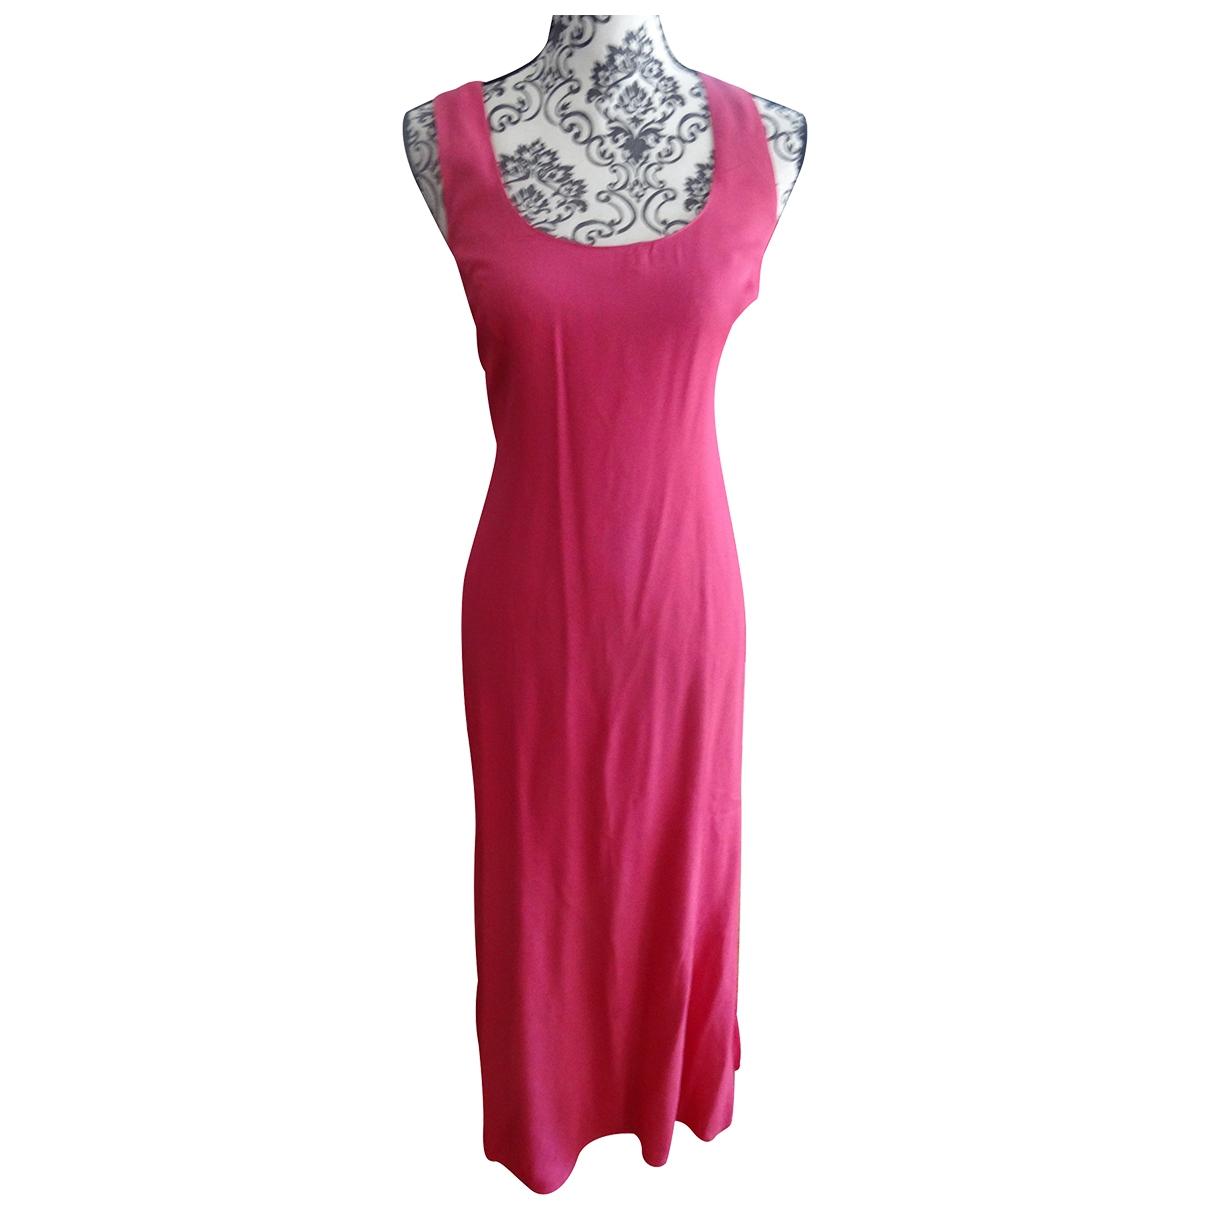 Gerard Darel \N Kleid in  Rosa Viskose